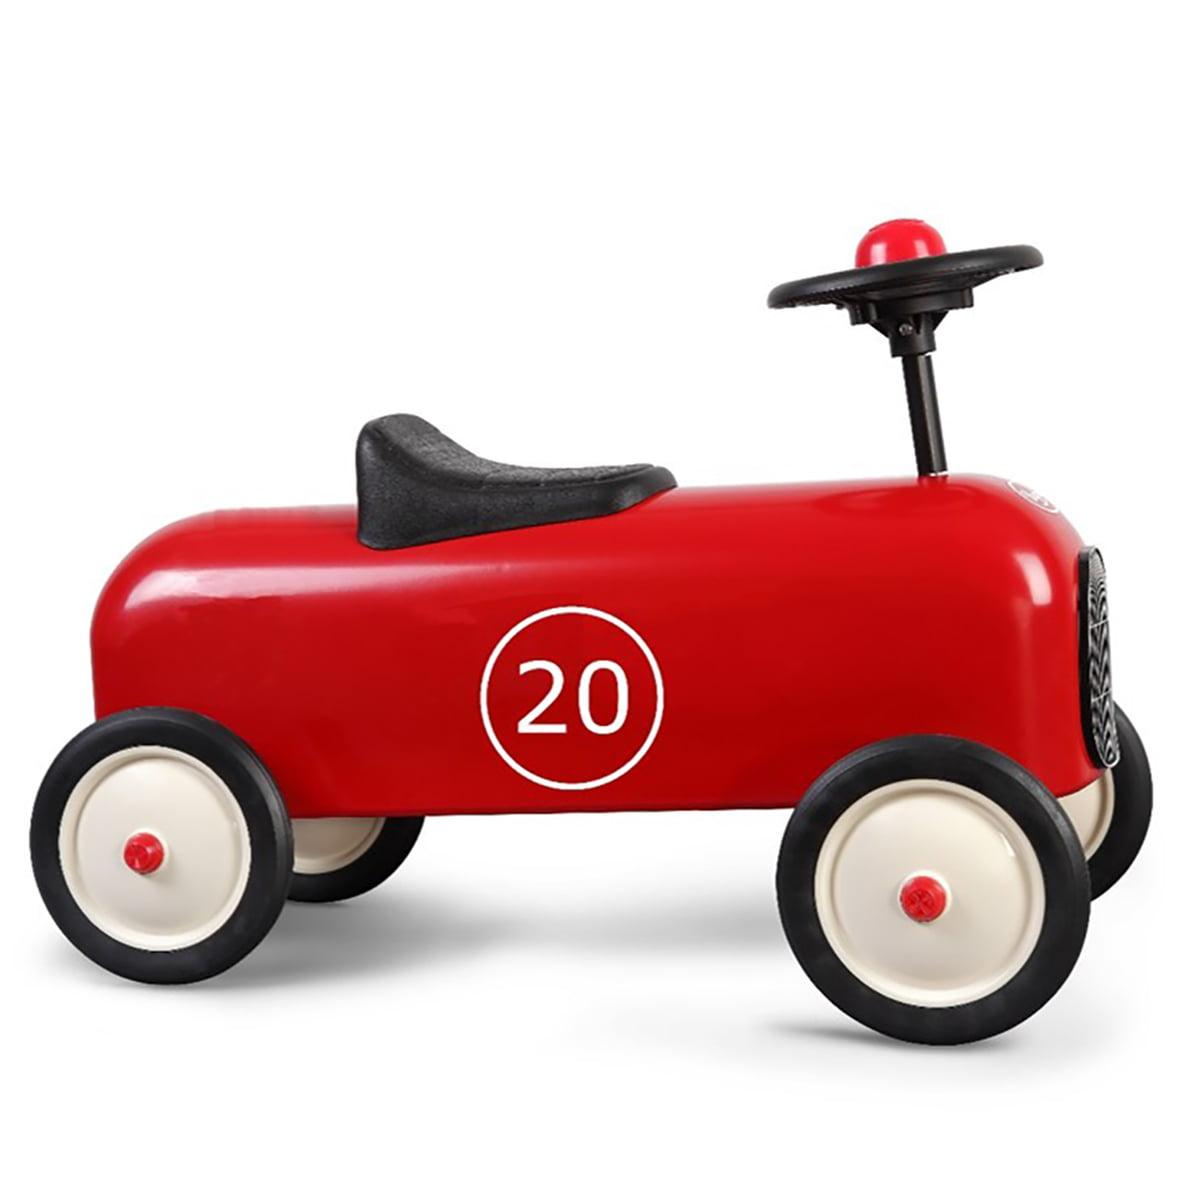 Baghera - Racer Rutschfahrzeug, rot   Kinderzimmer > Spielzeuge   Rot   Baghera